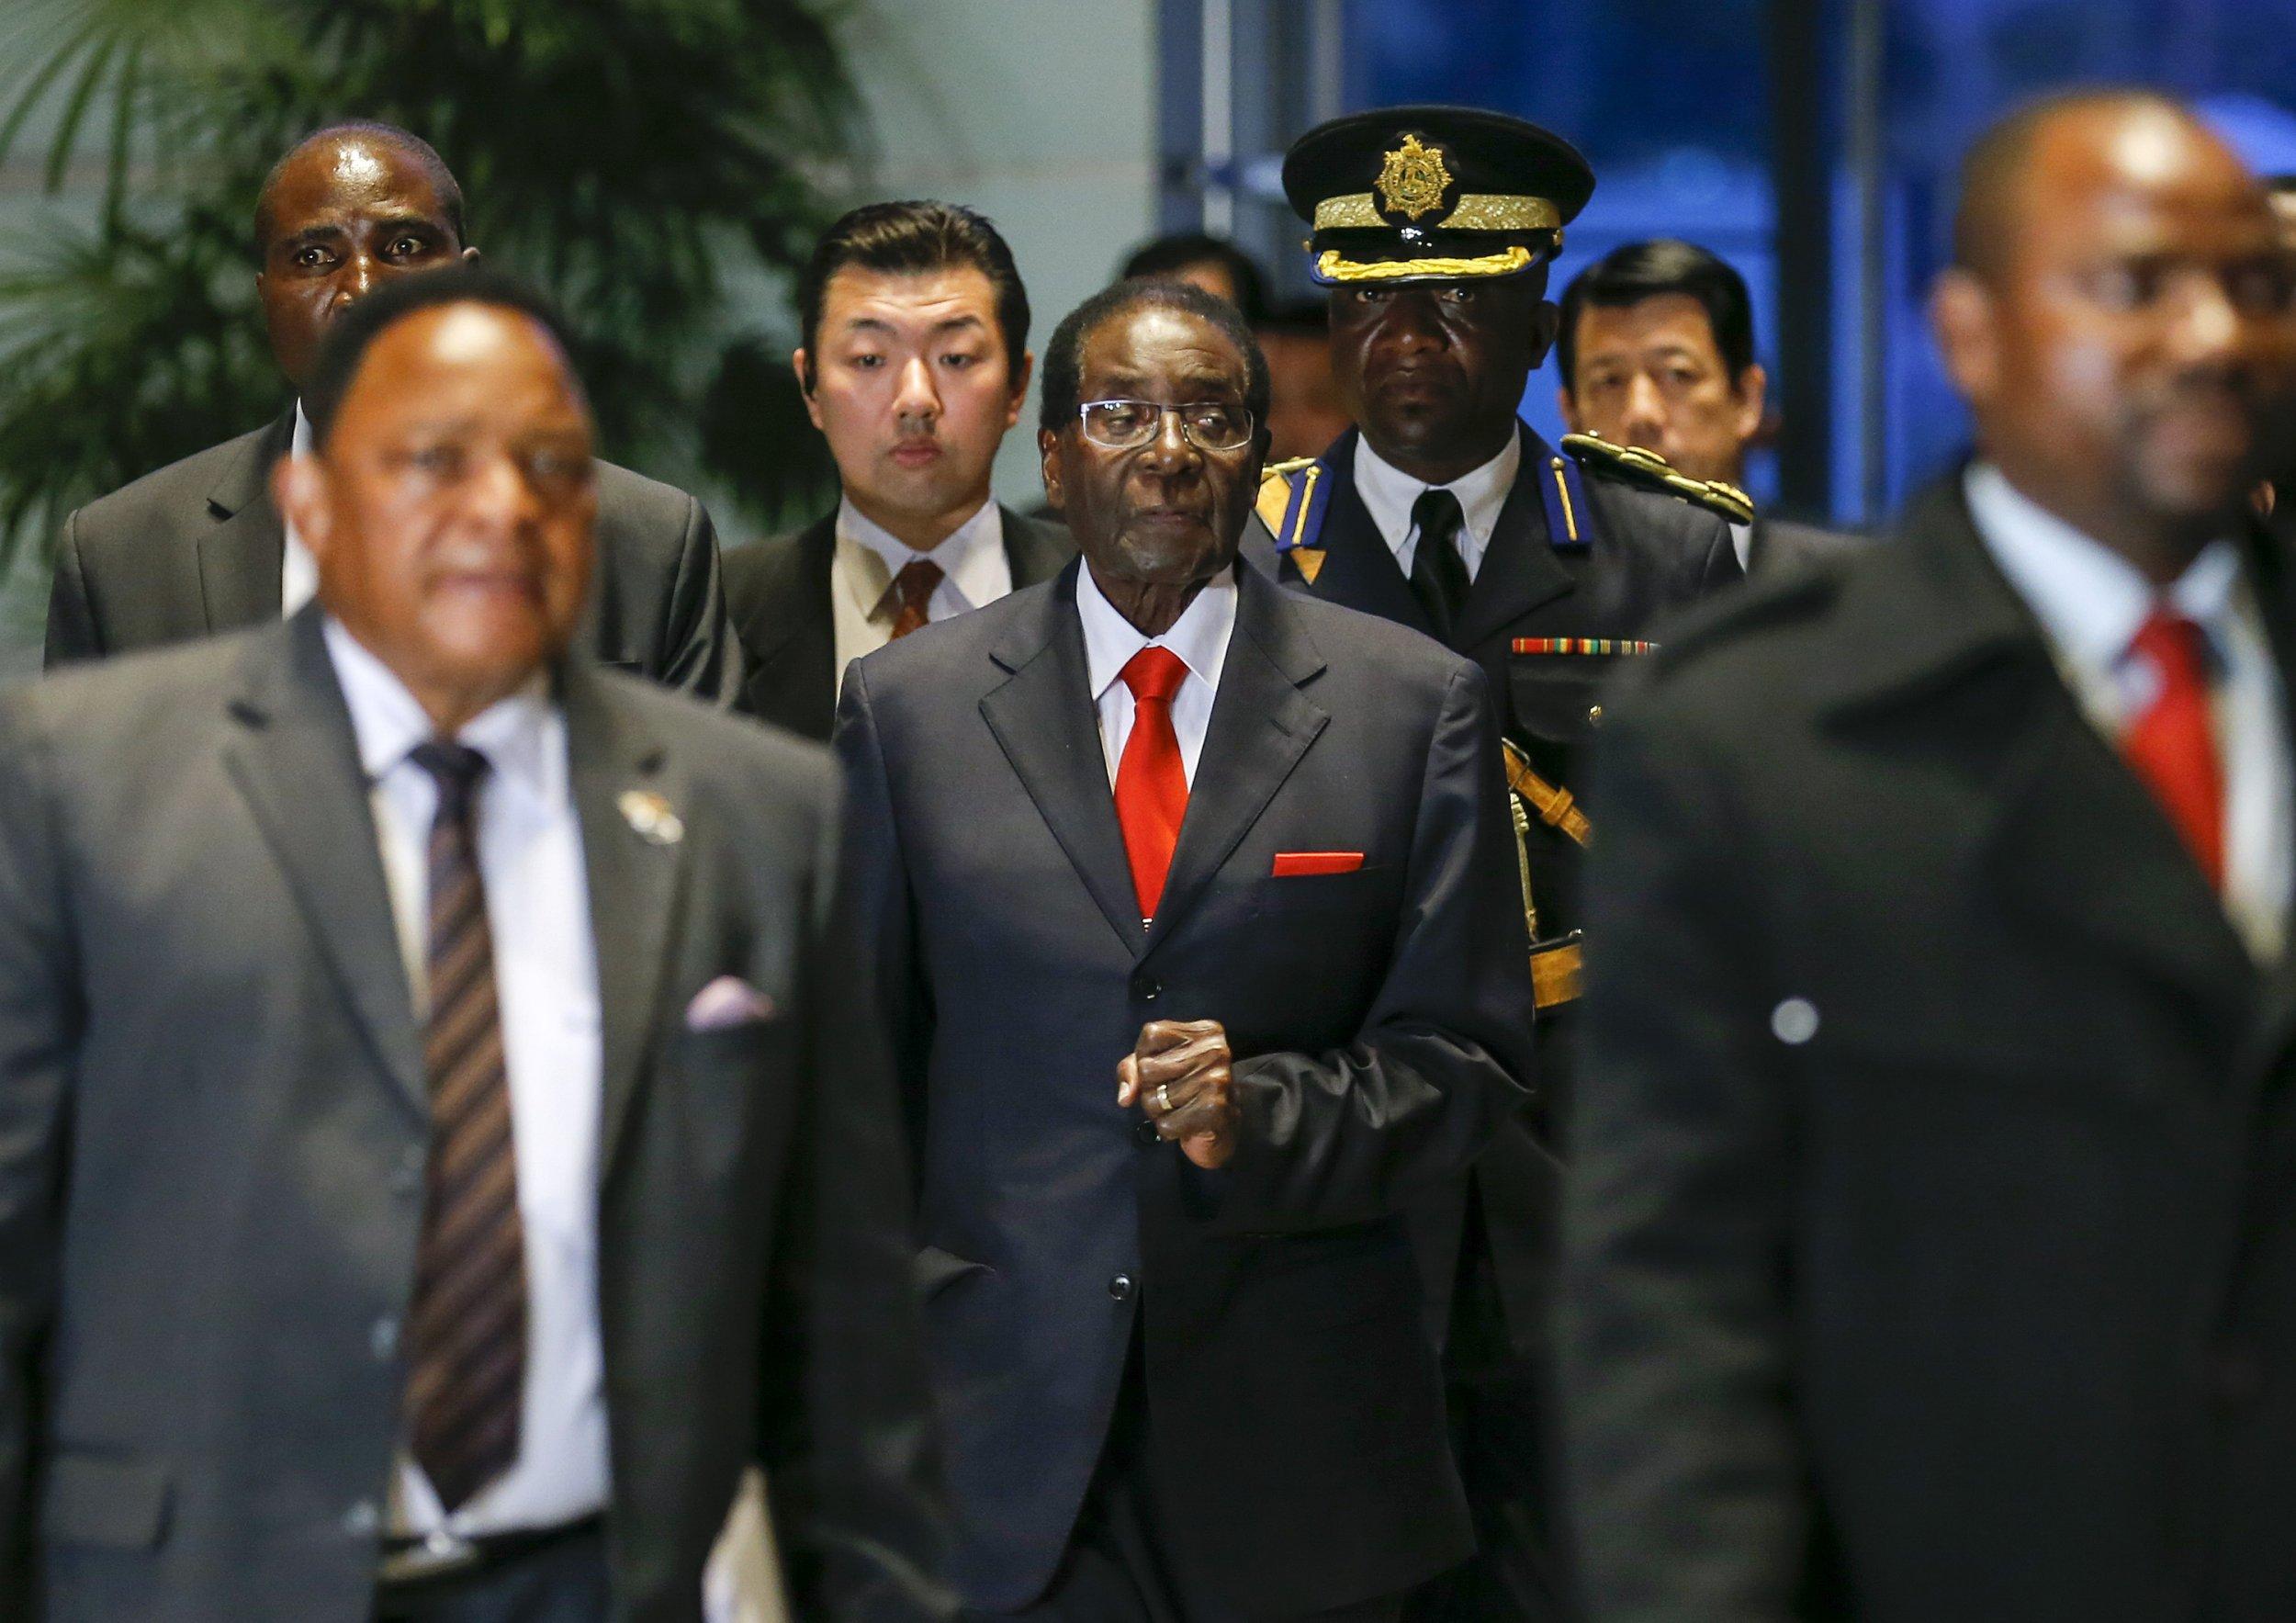 Zimbabwean President Robert Mugabe arrives for talks with Japanese Prime Minister Shinzo Abe in Tokyo.